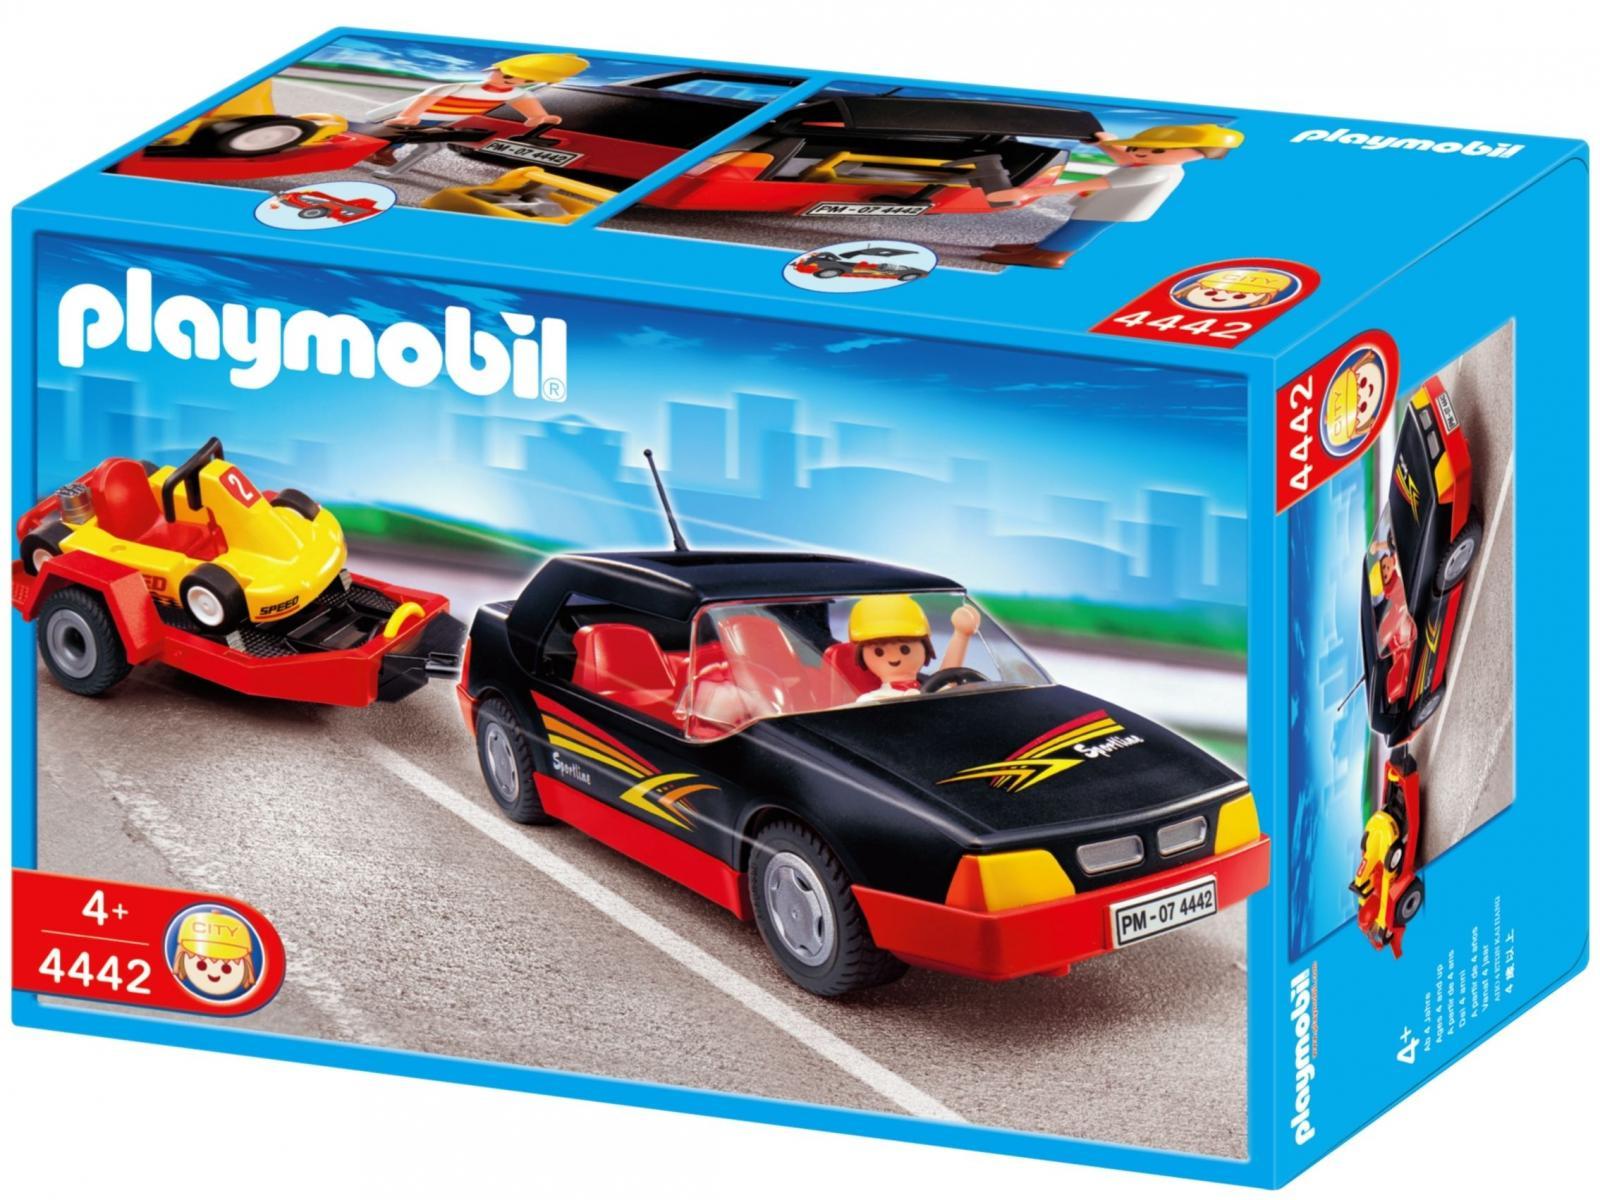 Playmobil voiture de sport avec kart 4442 - Voiture tuning playmobil ...